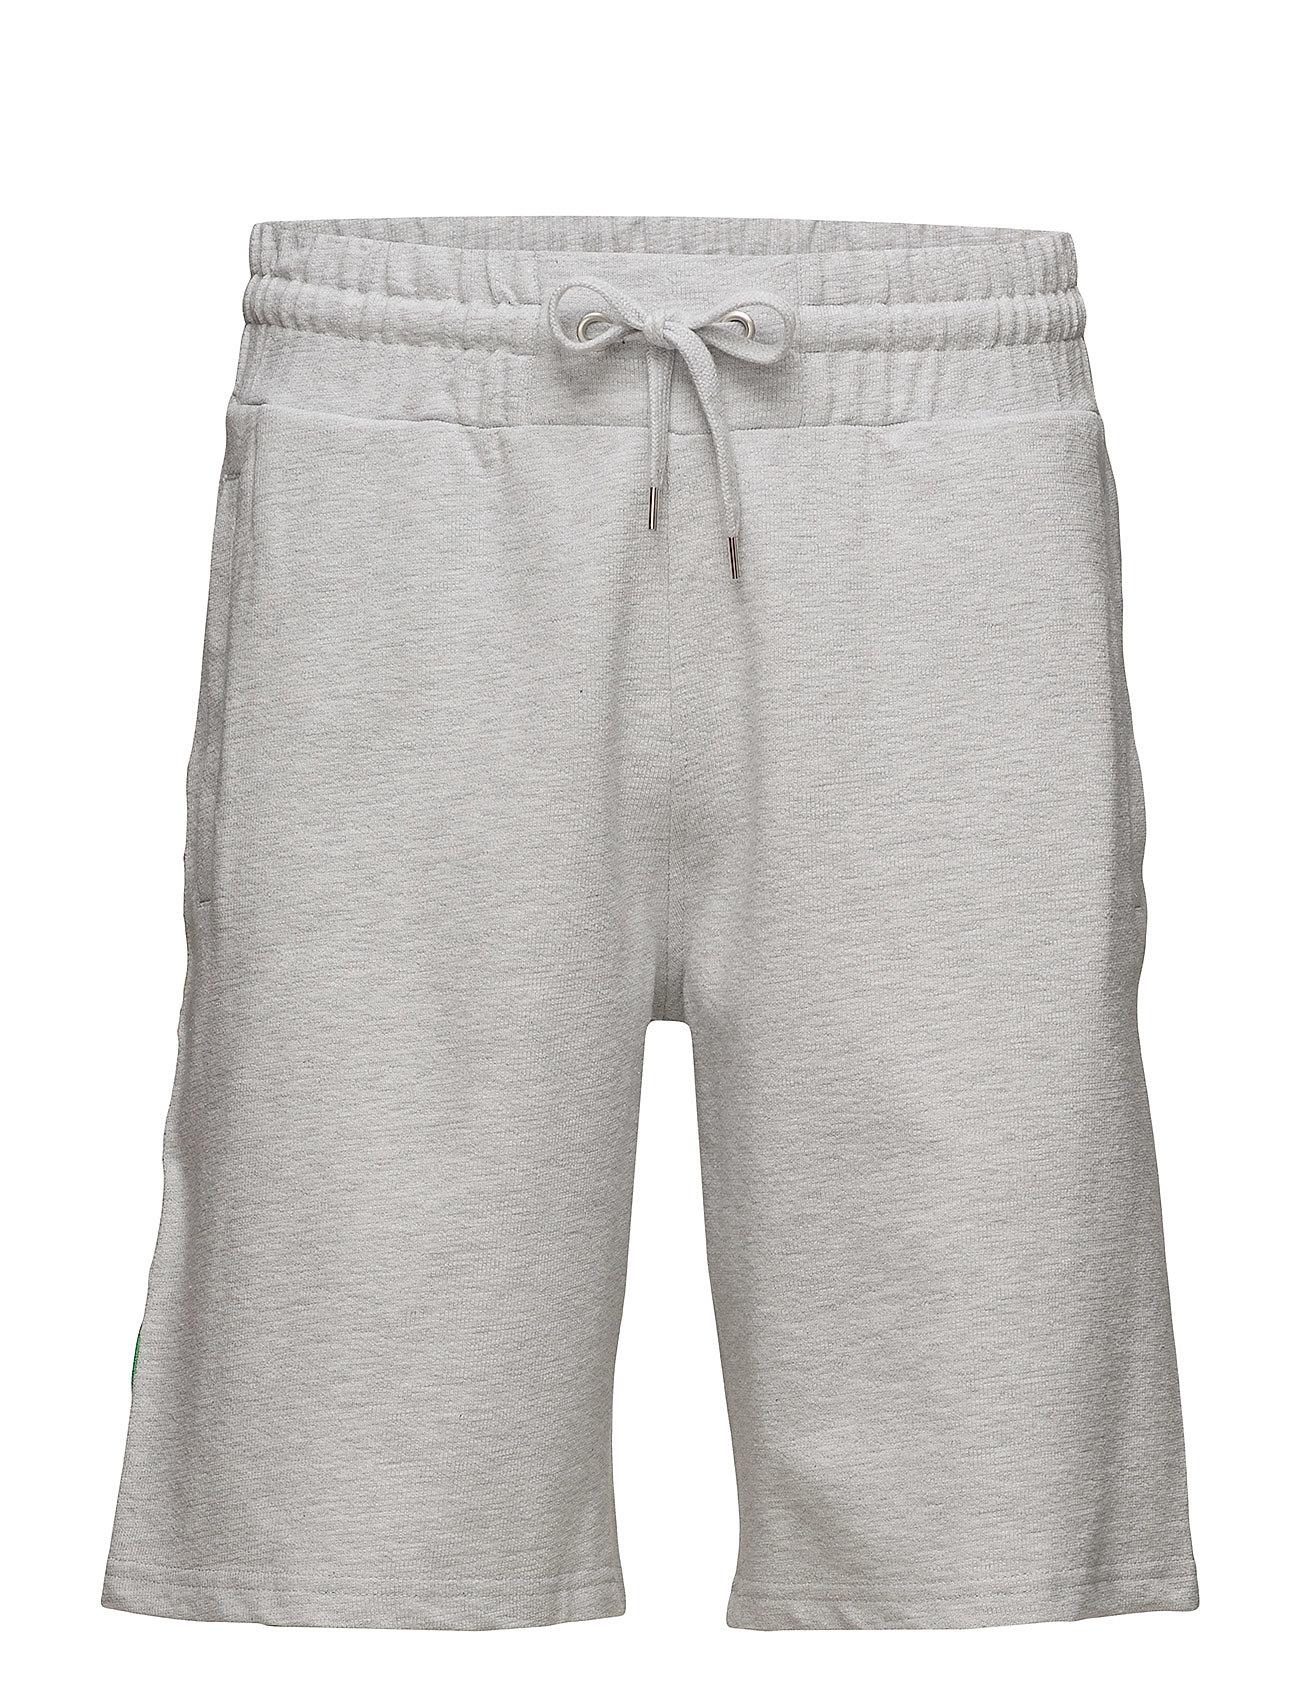 Kenzo Short Special Shorts